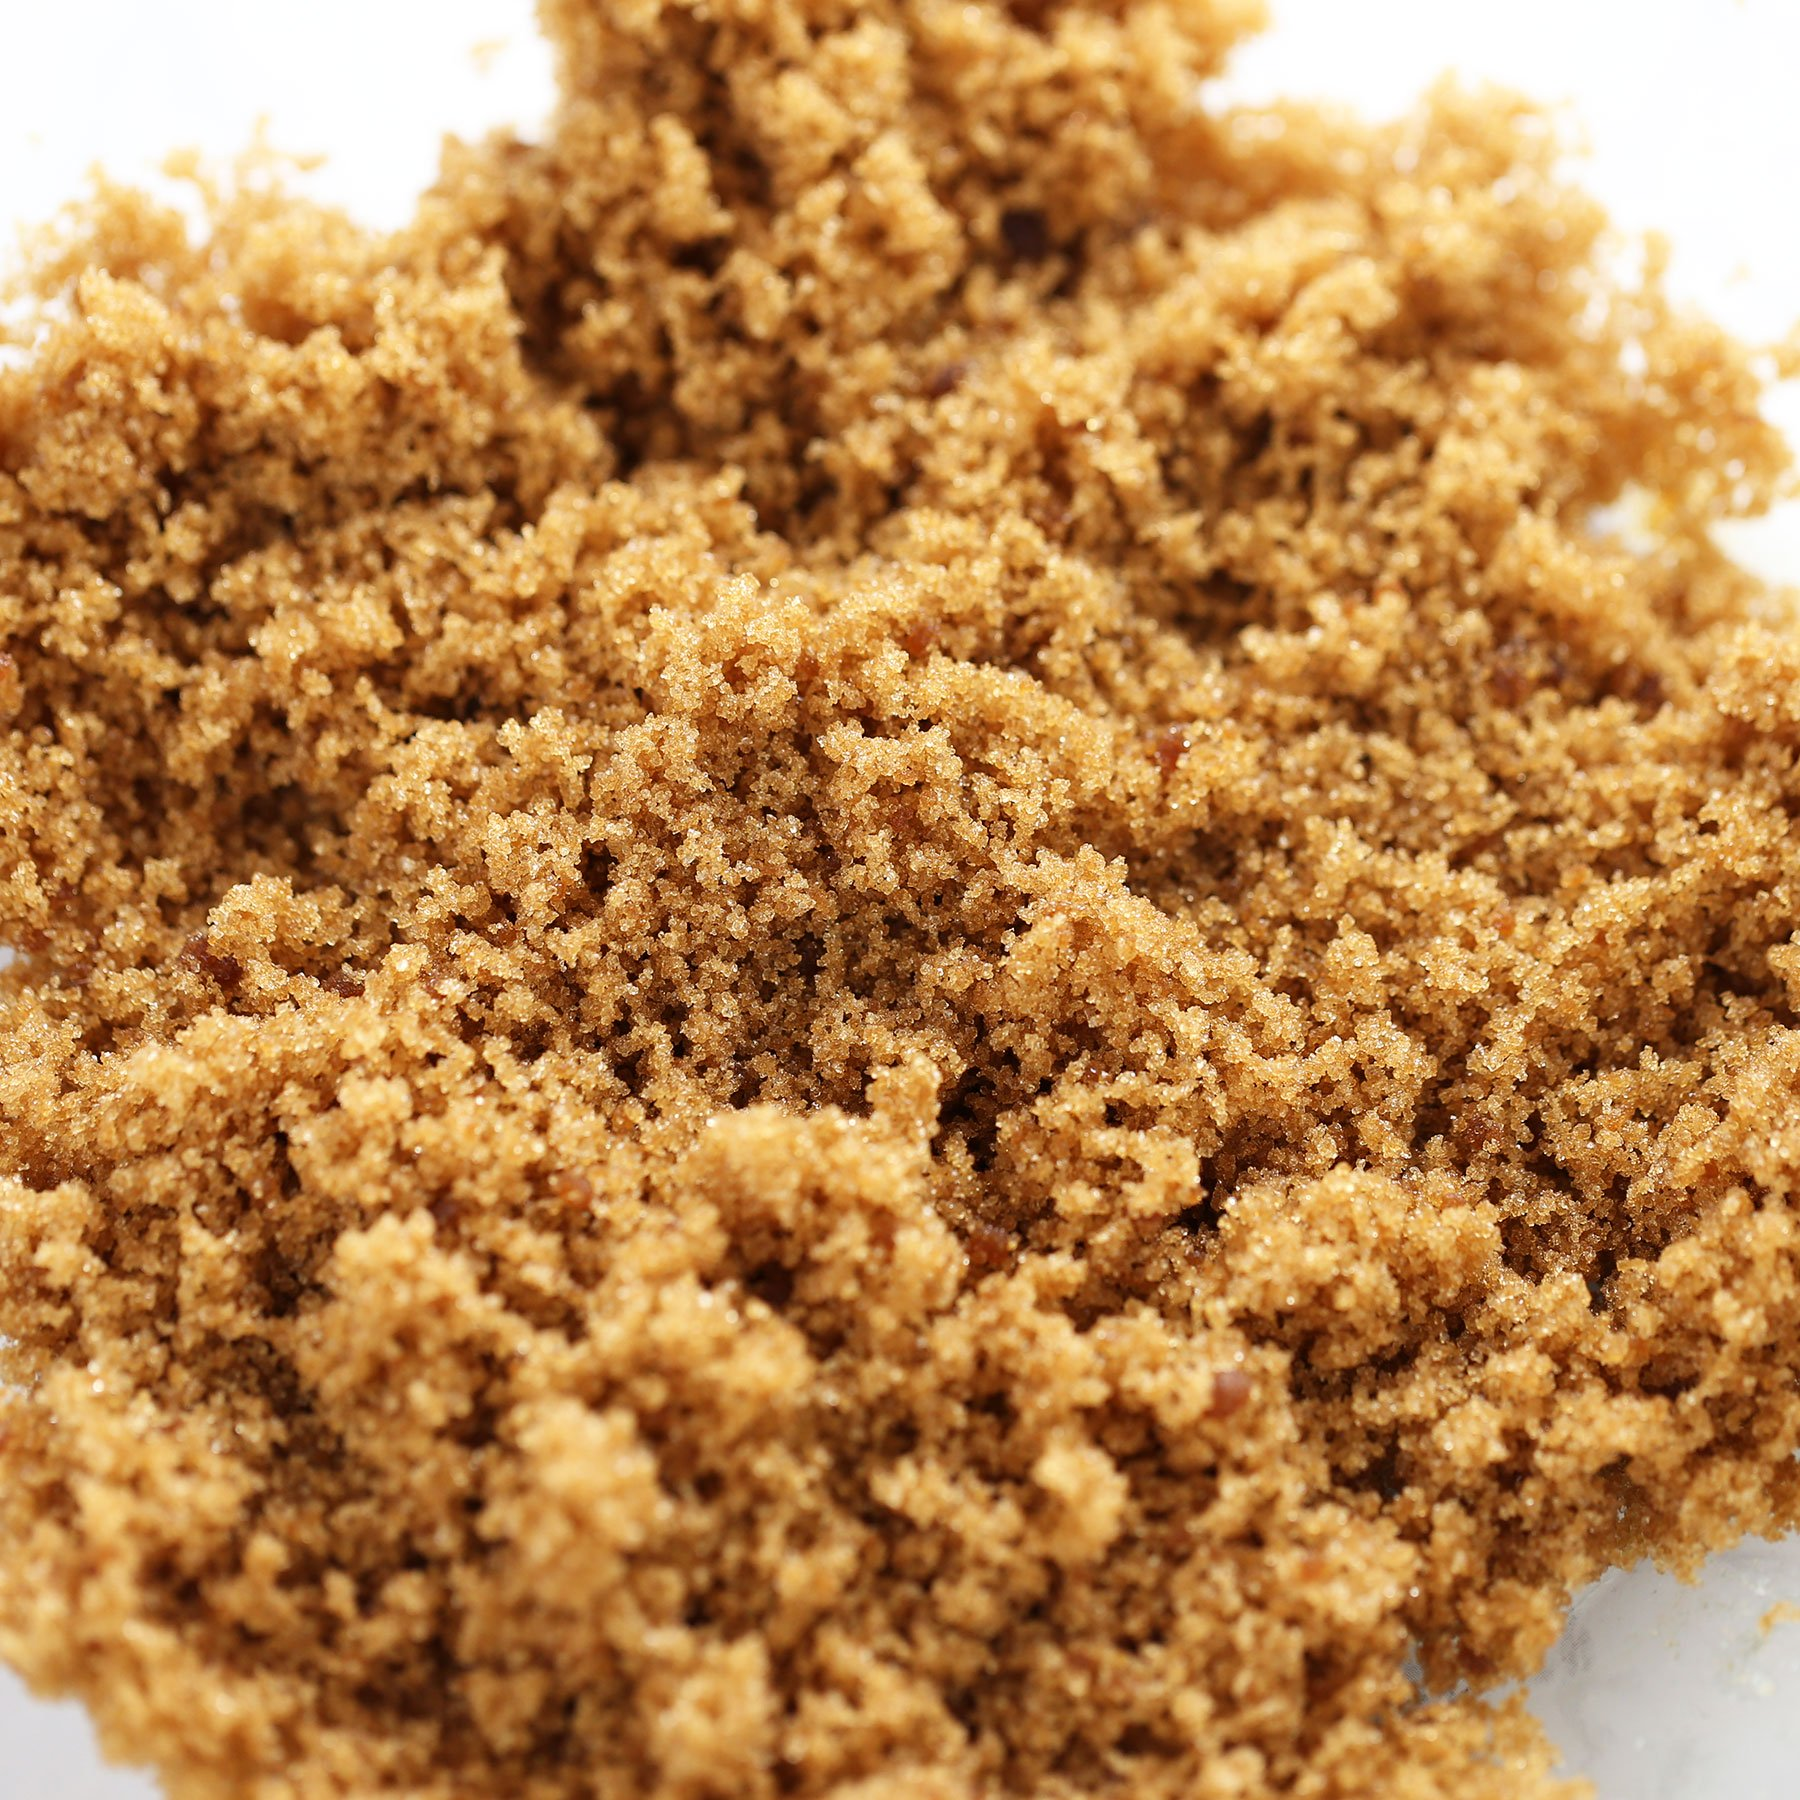 Brown Sugar Market Future Prospects 2025 | Sudzucker, Tate & Lyle, Imperial Sugar